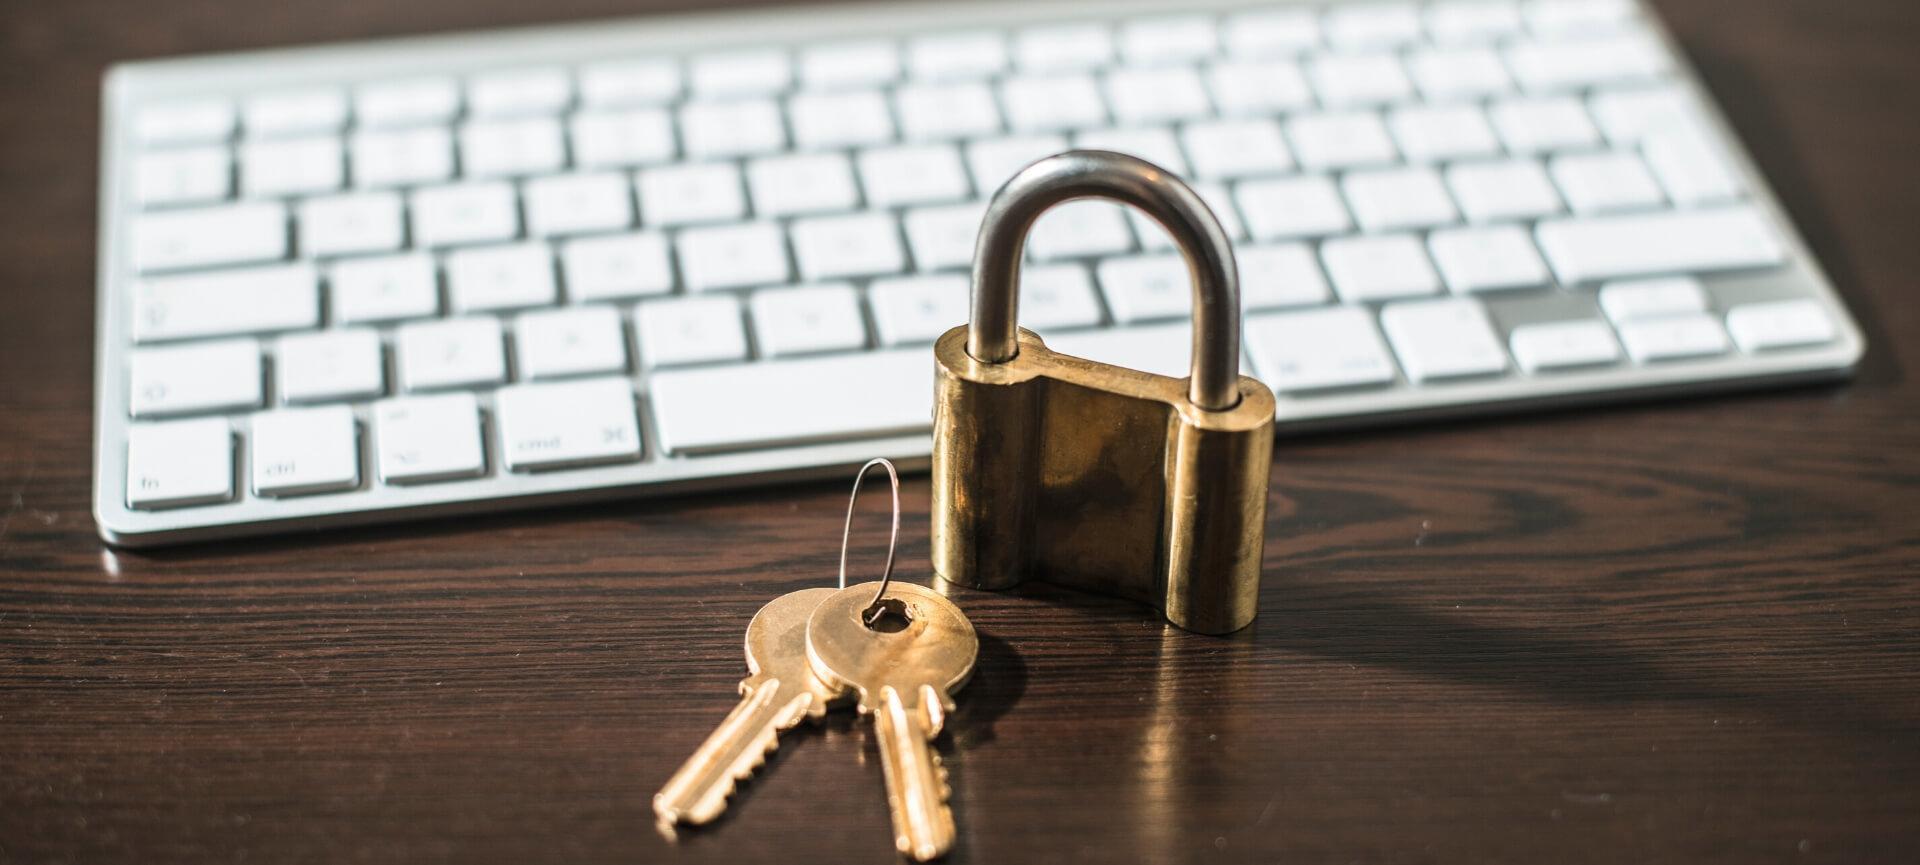 Padlock and key next to keyboard